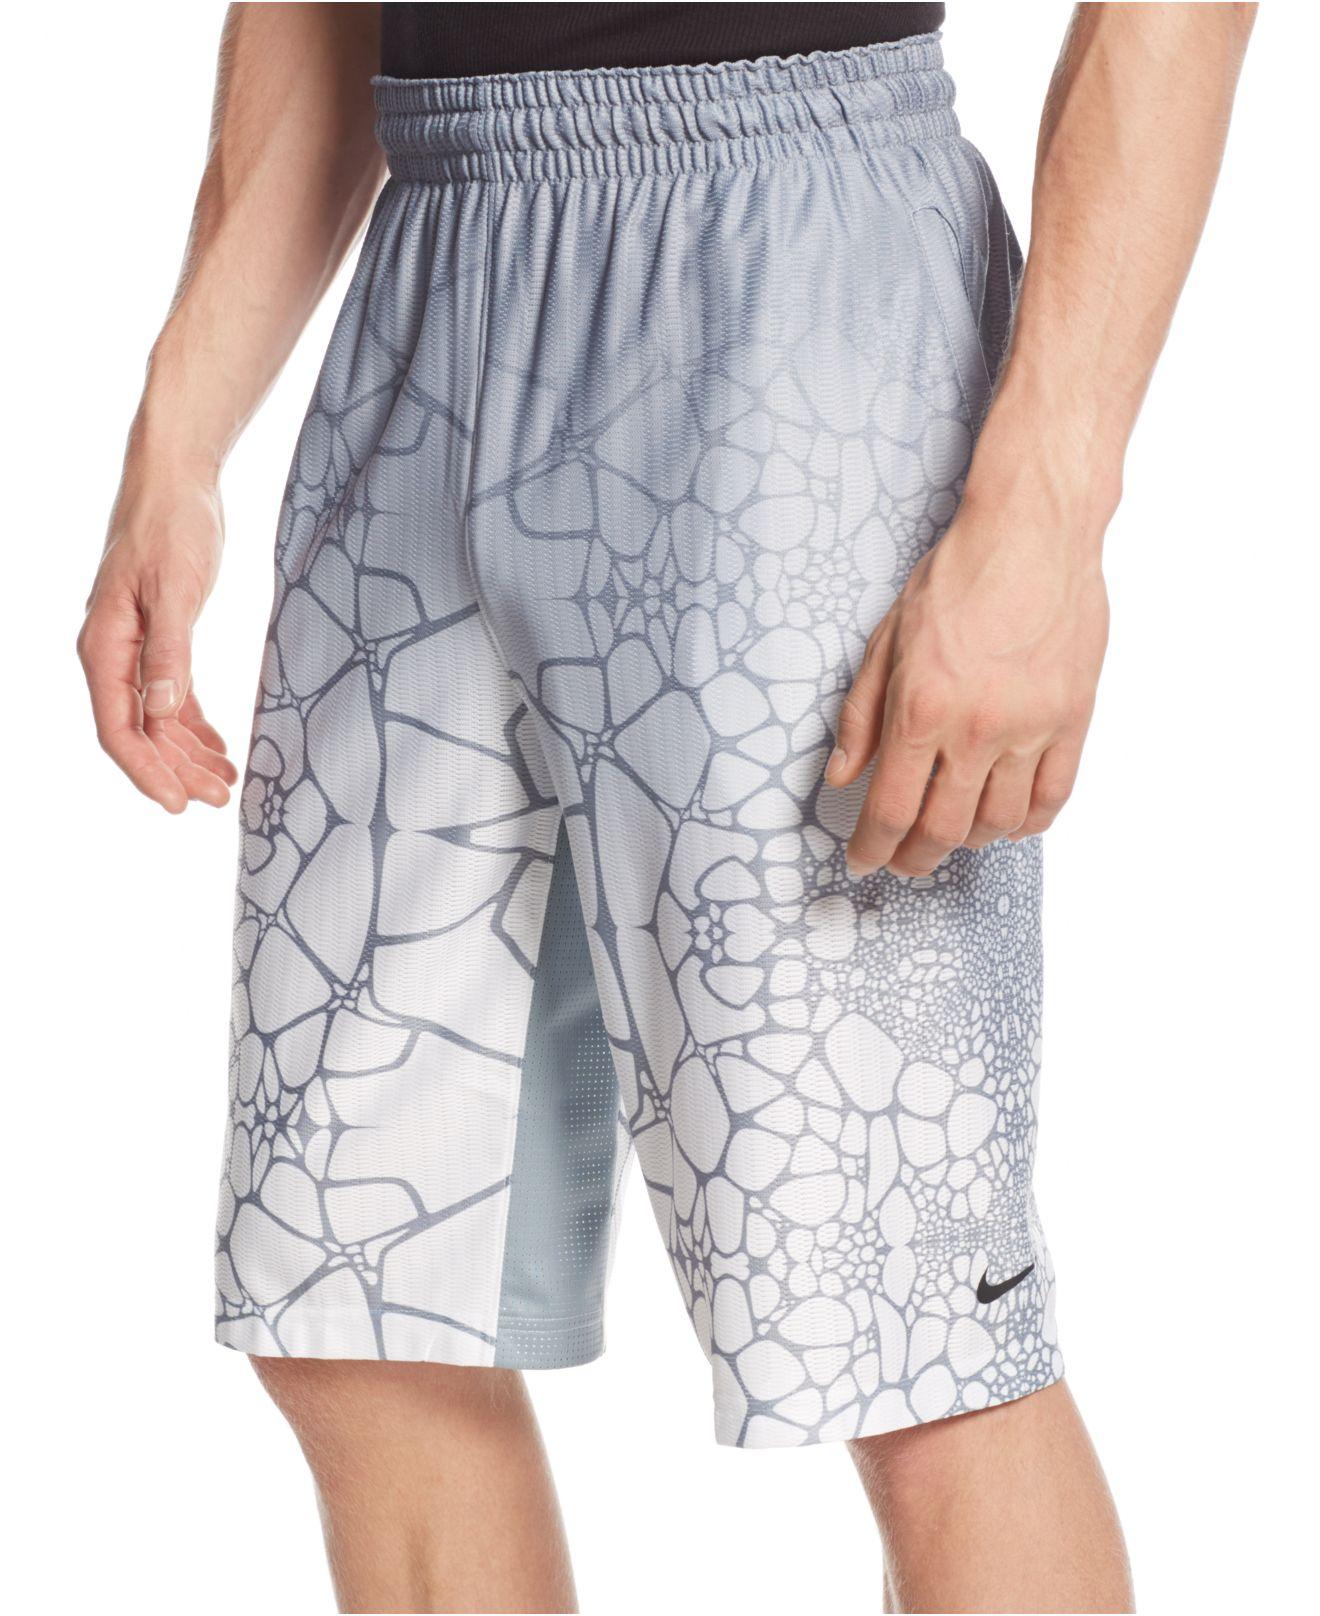 239307c43 ... promo code for lyst nike lebron tamed 12 basketball shorts in gray for  men b21d9 b524d